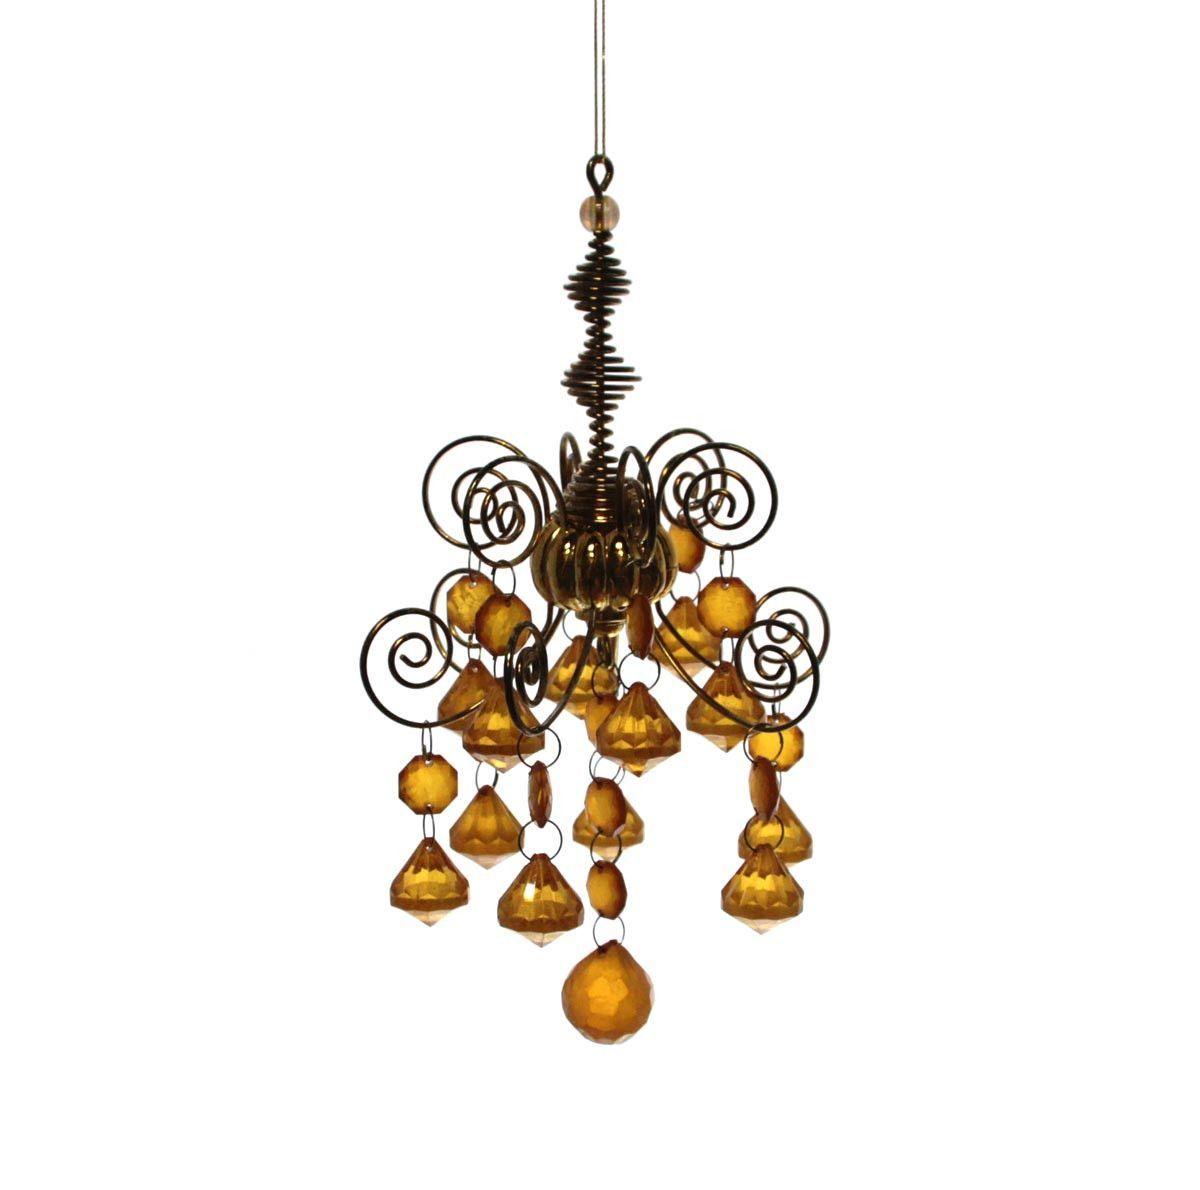 Chandelier Amber Ornament